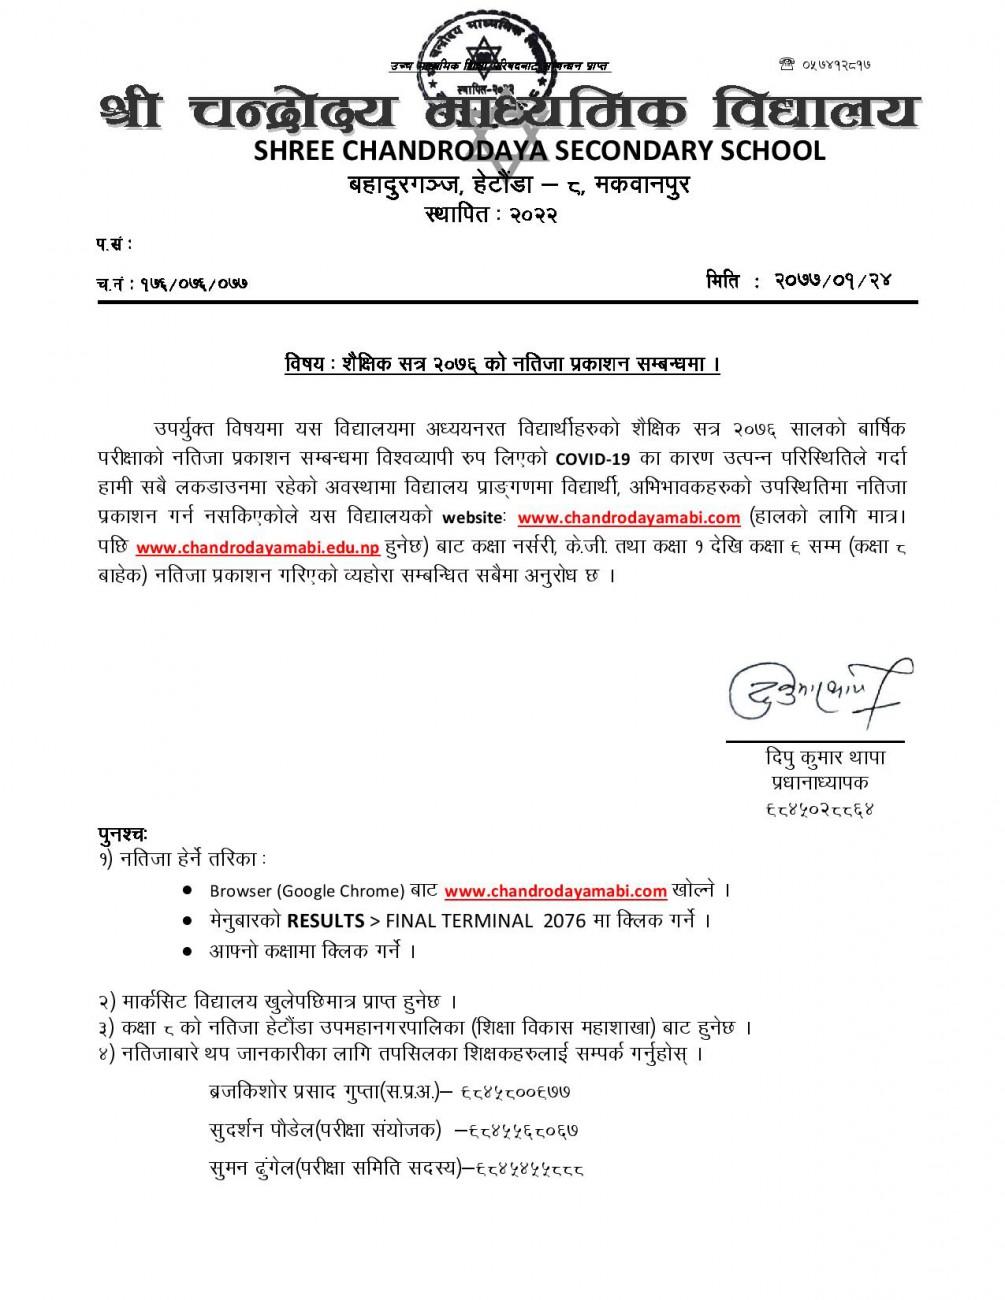 notice-1-page-001-1588766456.jpg